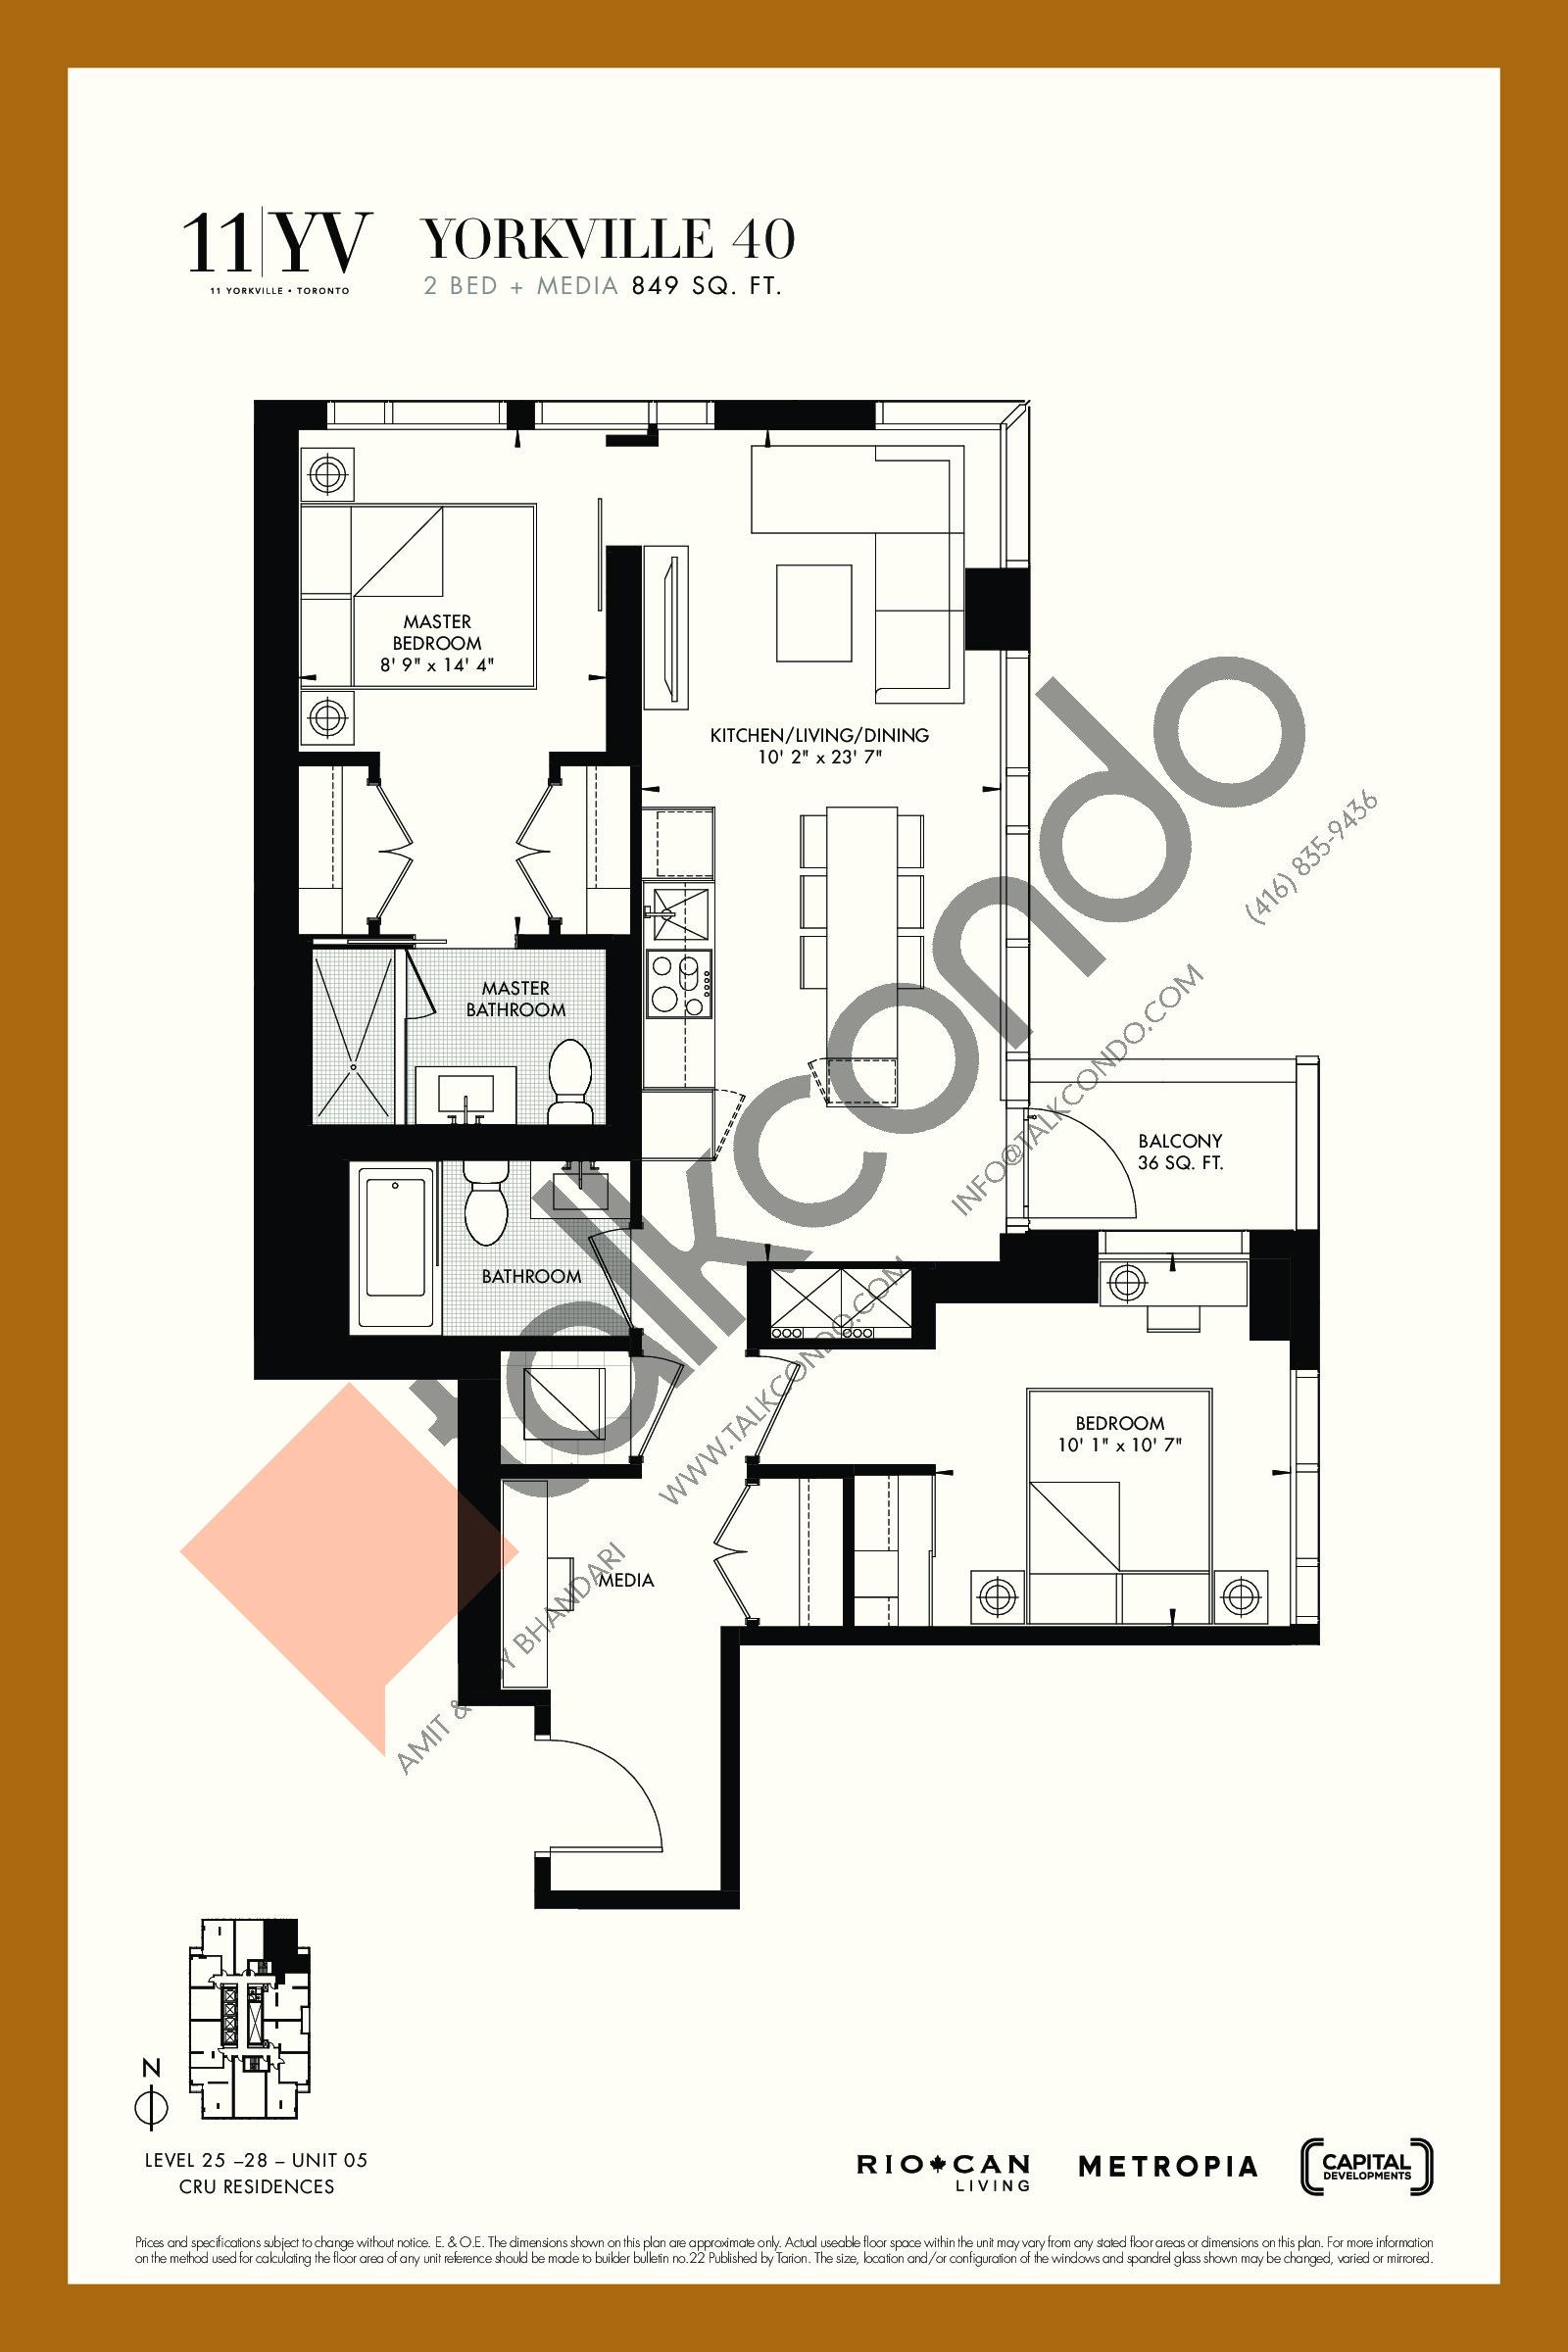 Yorkville 40 Floor Plan at 11YV Condos - 849 sq.ft